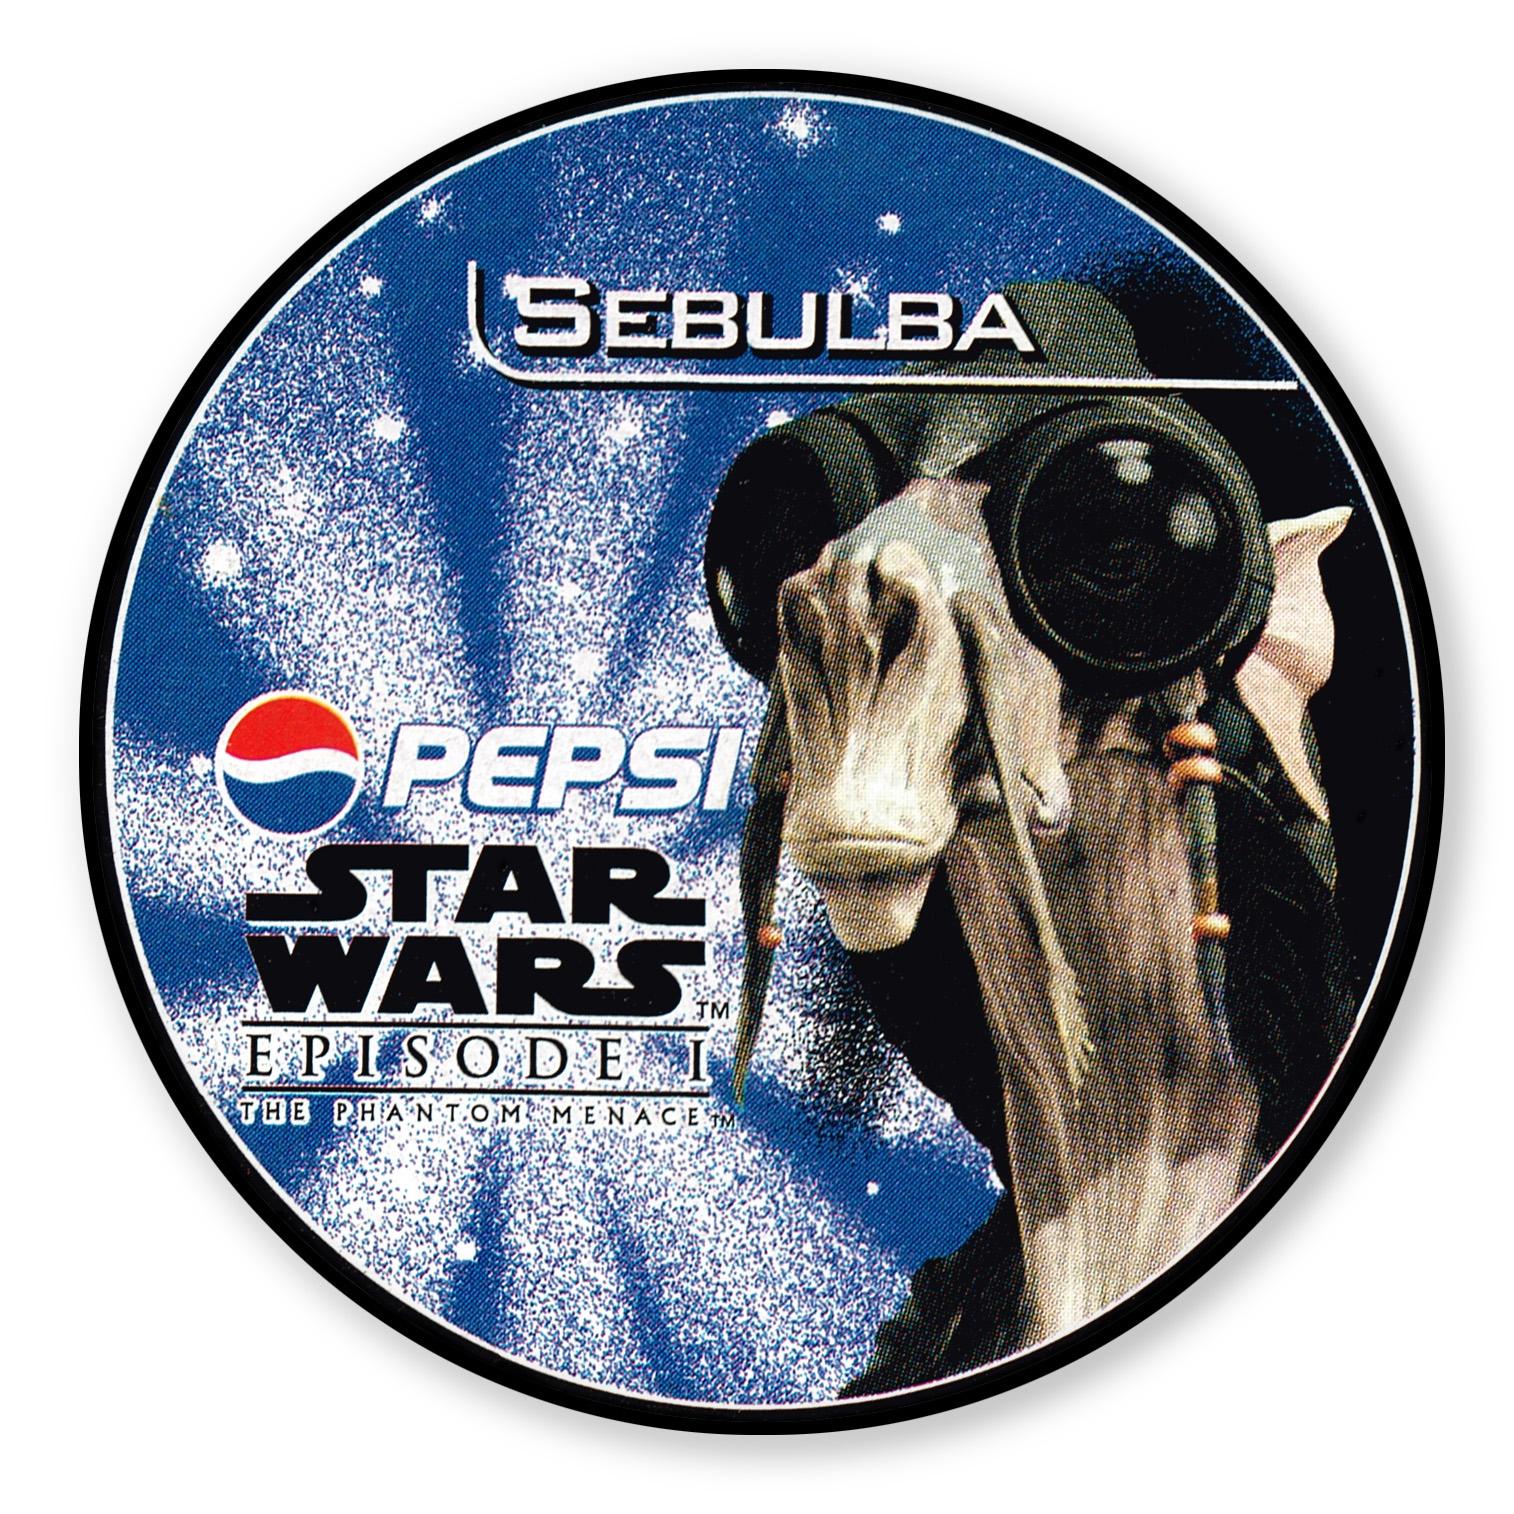 Sebulba Pepsi card (NZ, 1999)